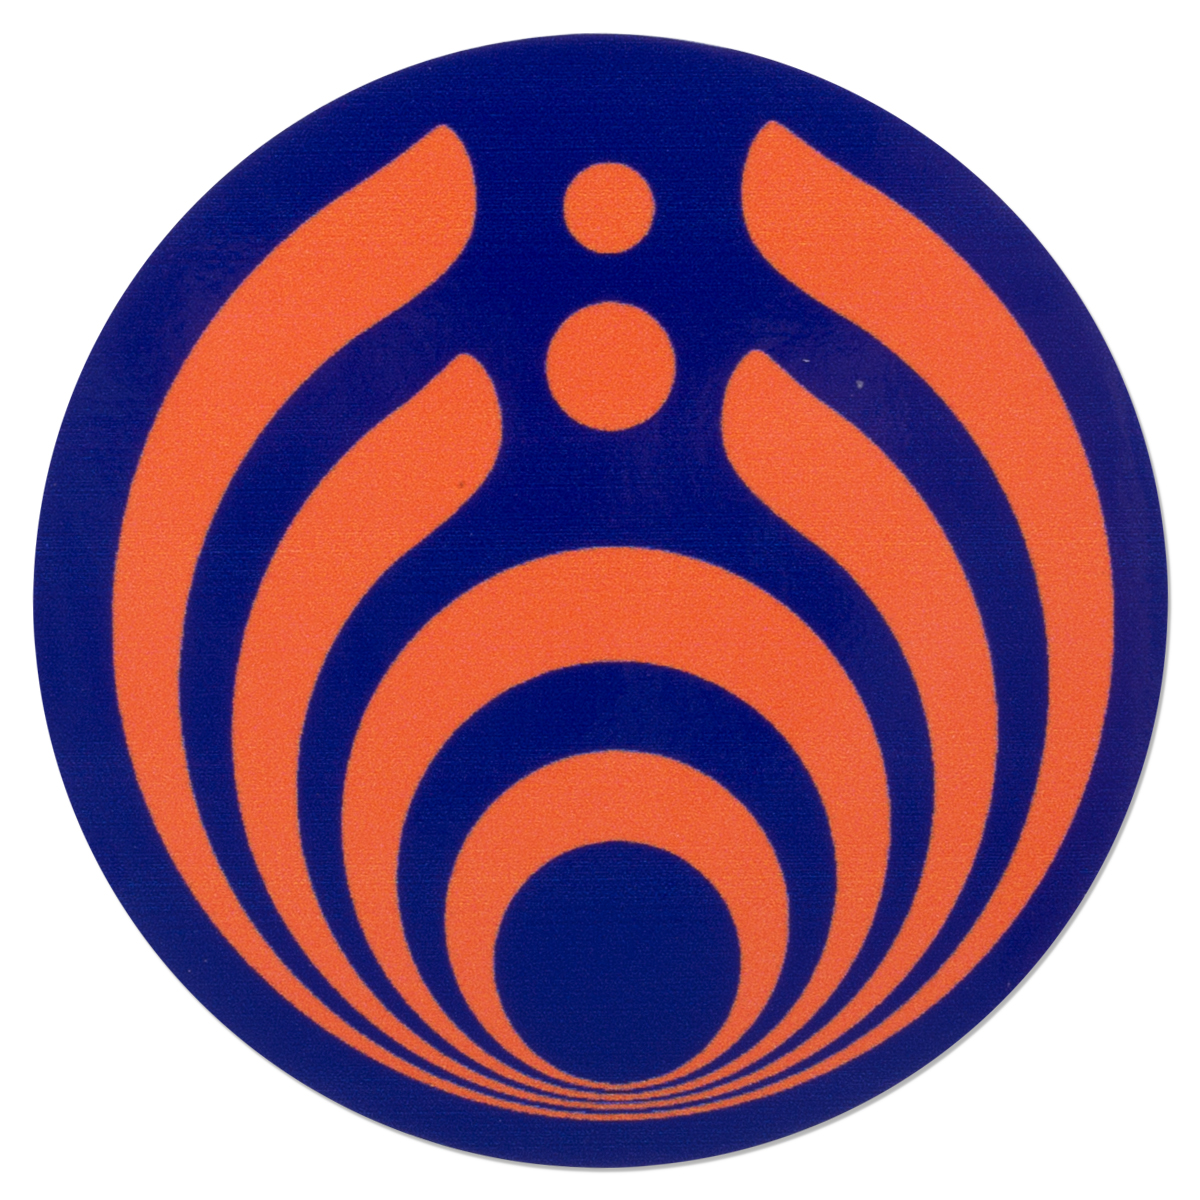 Purple and Orange Emblem Sticker